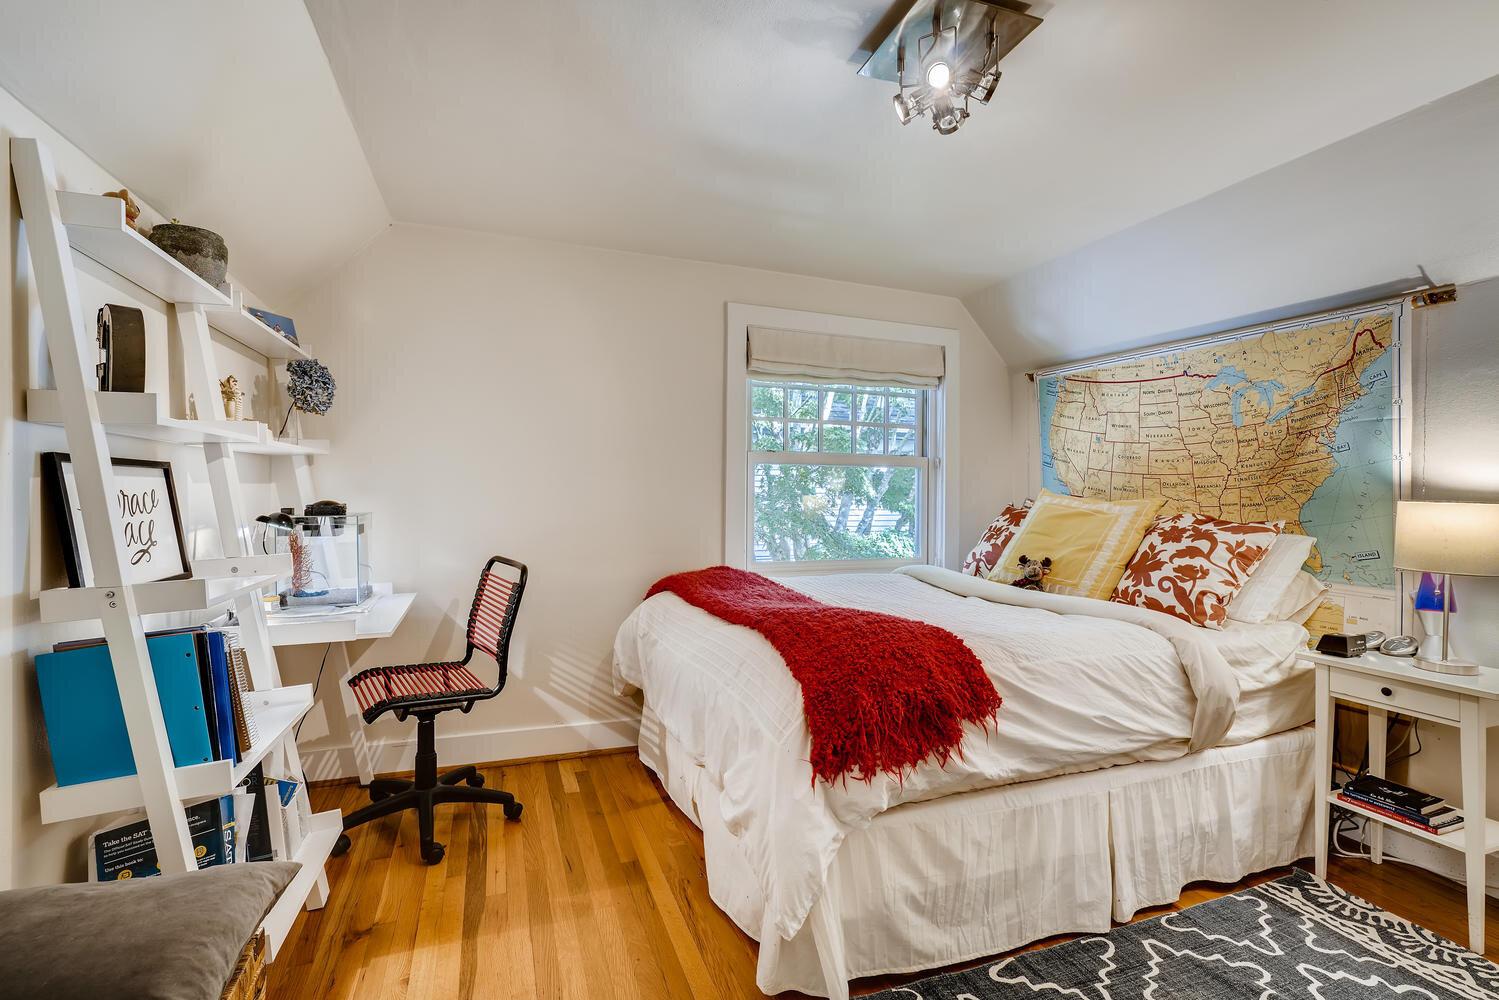 2111 29th Ave W Seattle WA-large-022-009-2nd Floor Bedroom-1500x1000-72dpi.jpg